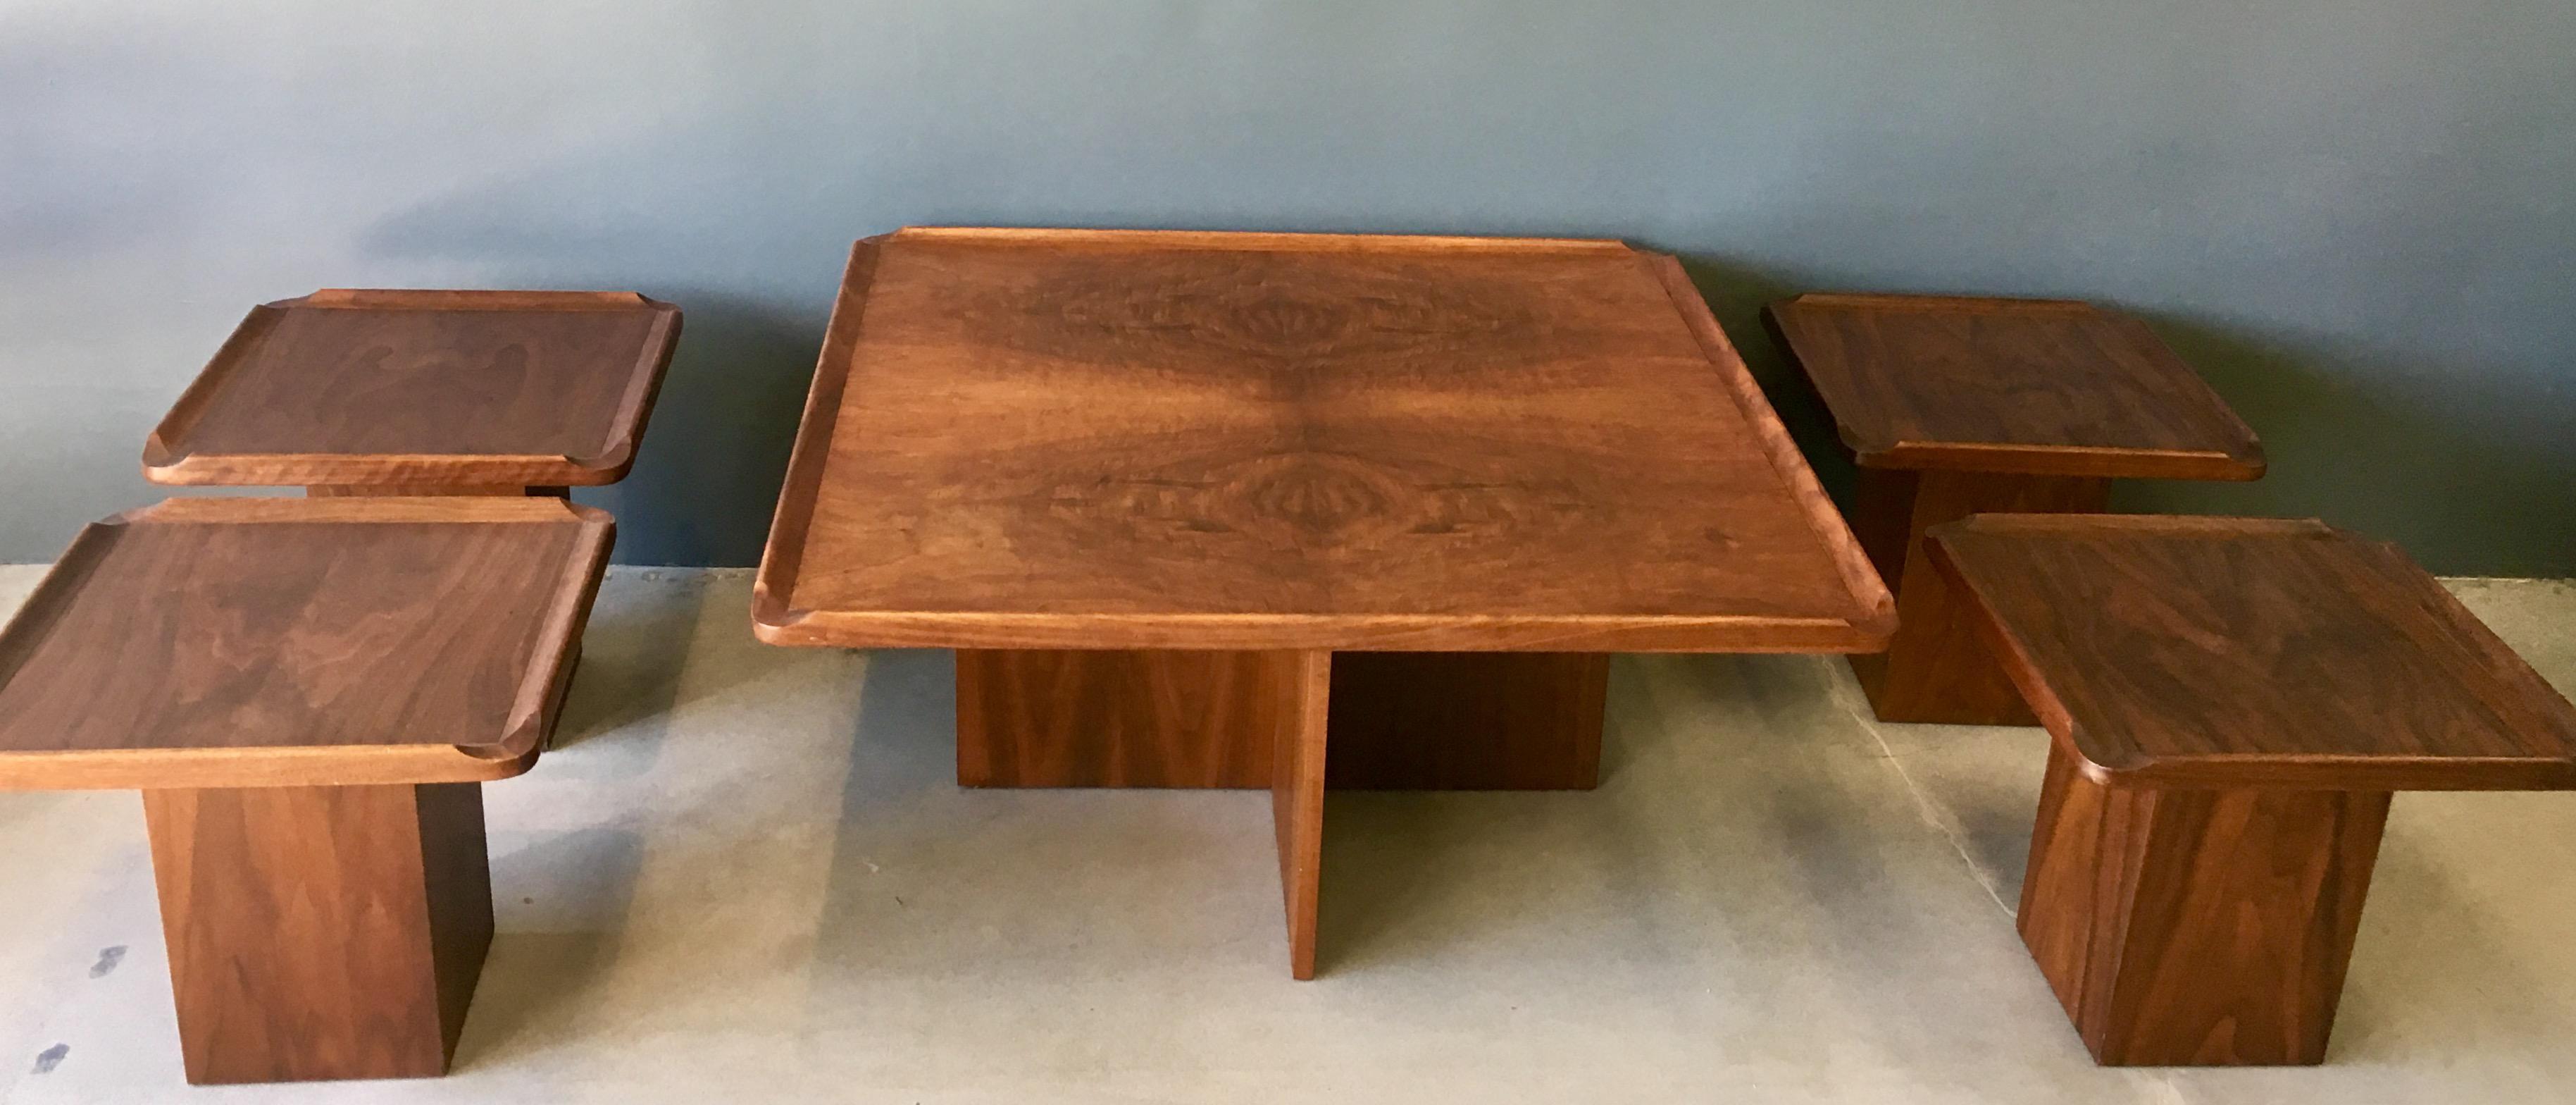 Brown Saltman Mid Century Coffee U0026 Nesting Tables   5 Pieces   Image 2 Of